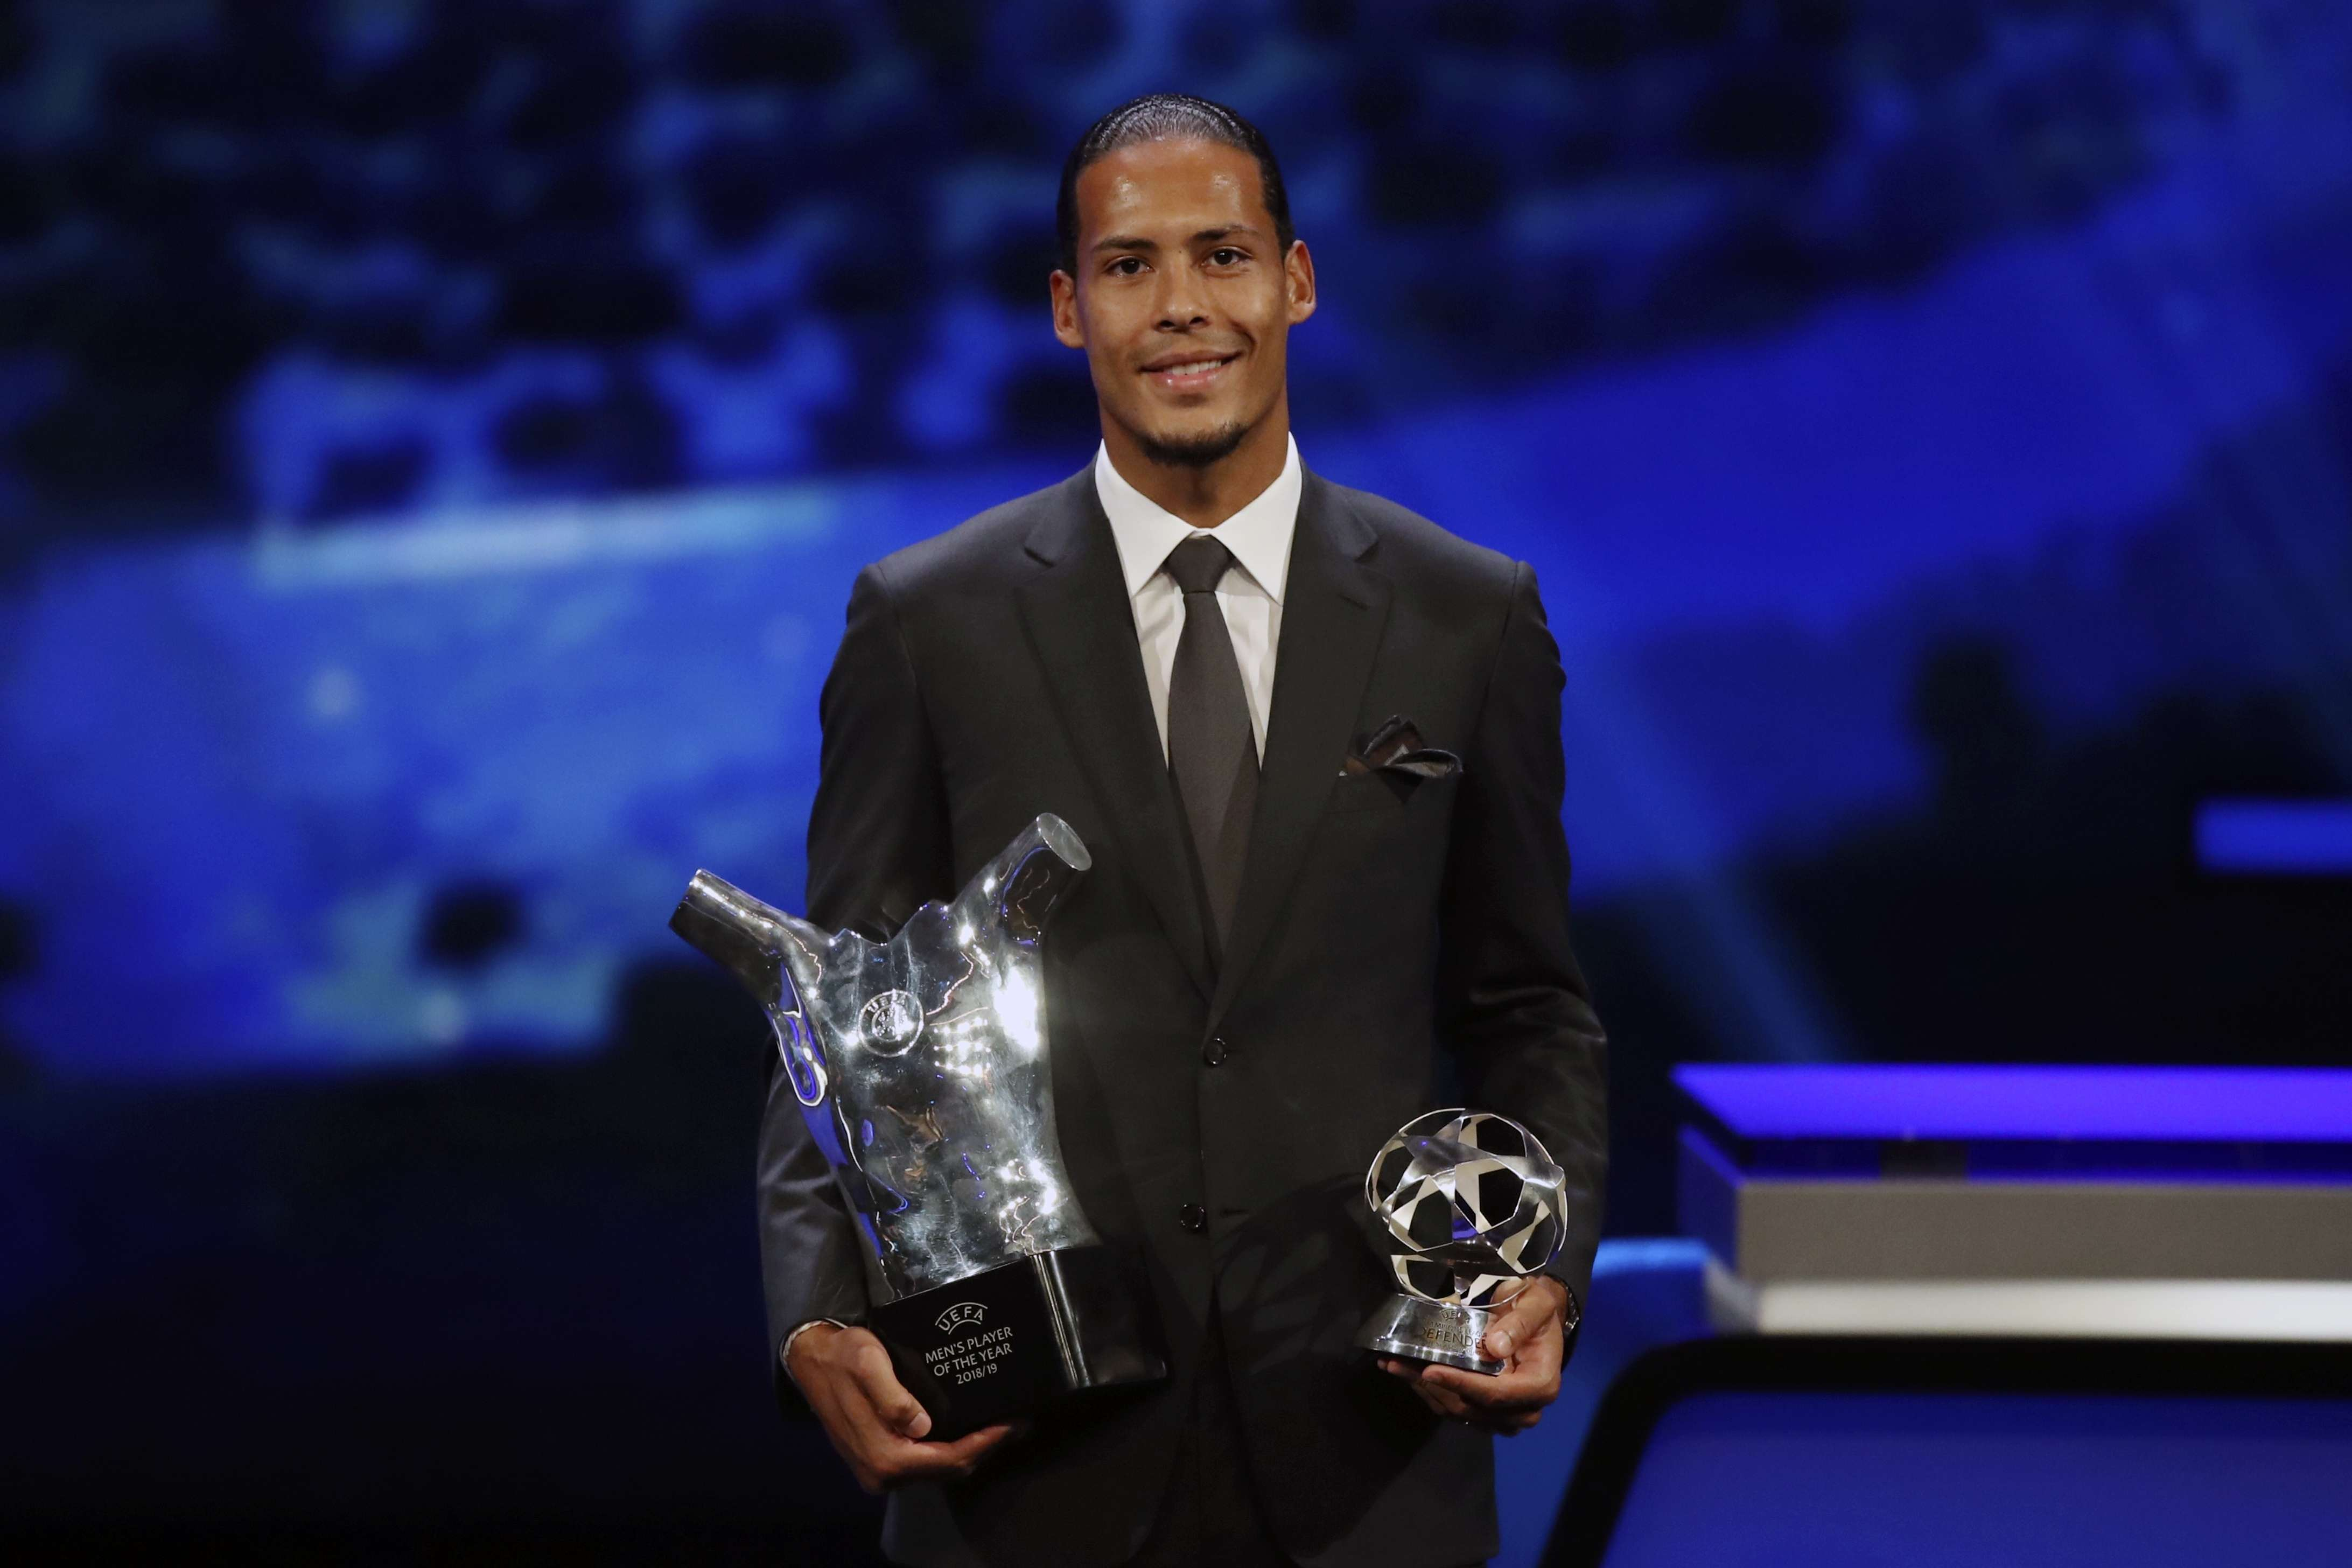 Virgil Van Dijk, el primer defensa en ser elegido Jugador del Año de la UEFA. Foto: AP